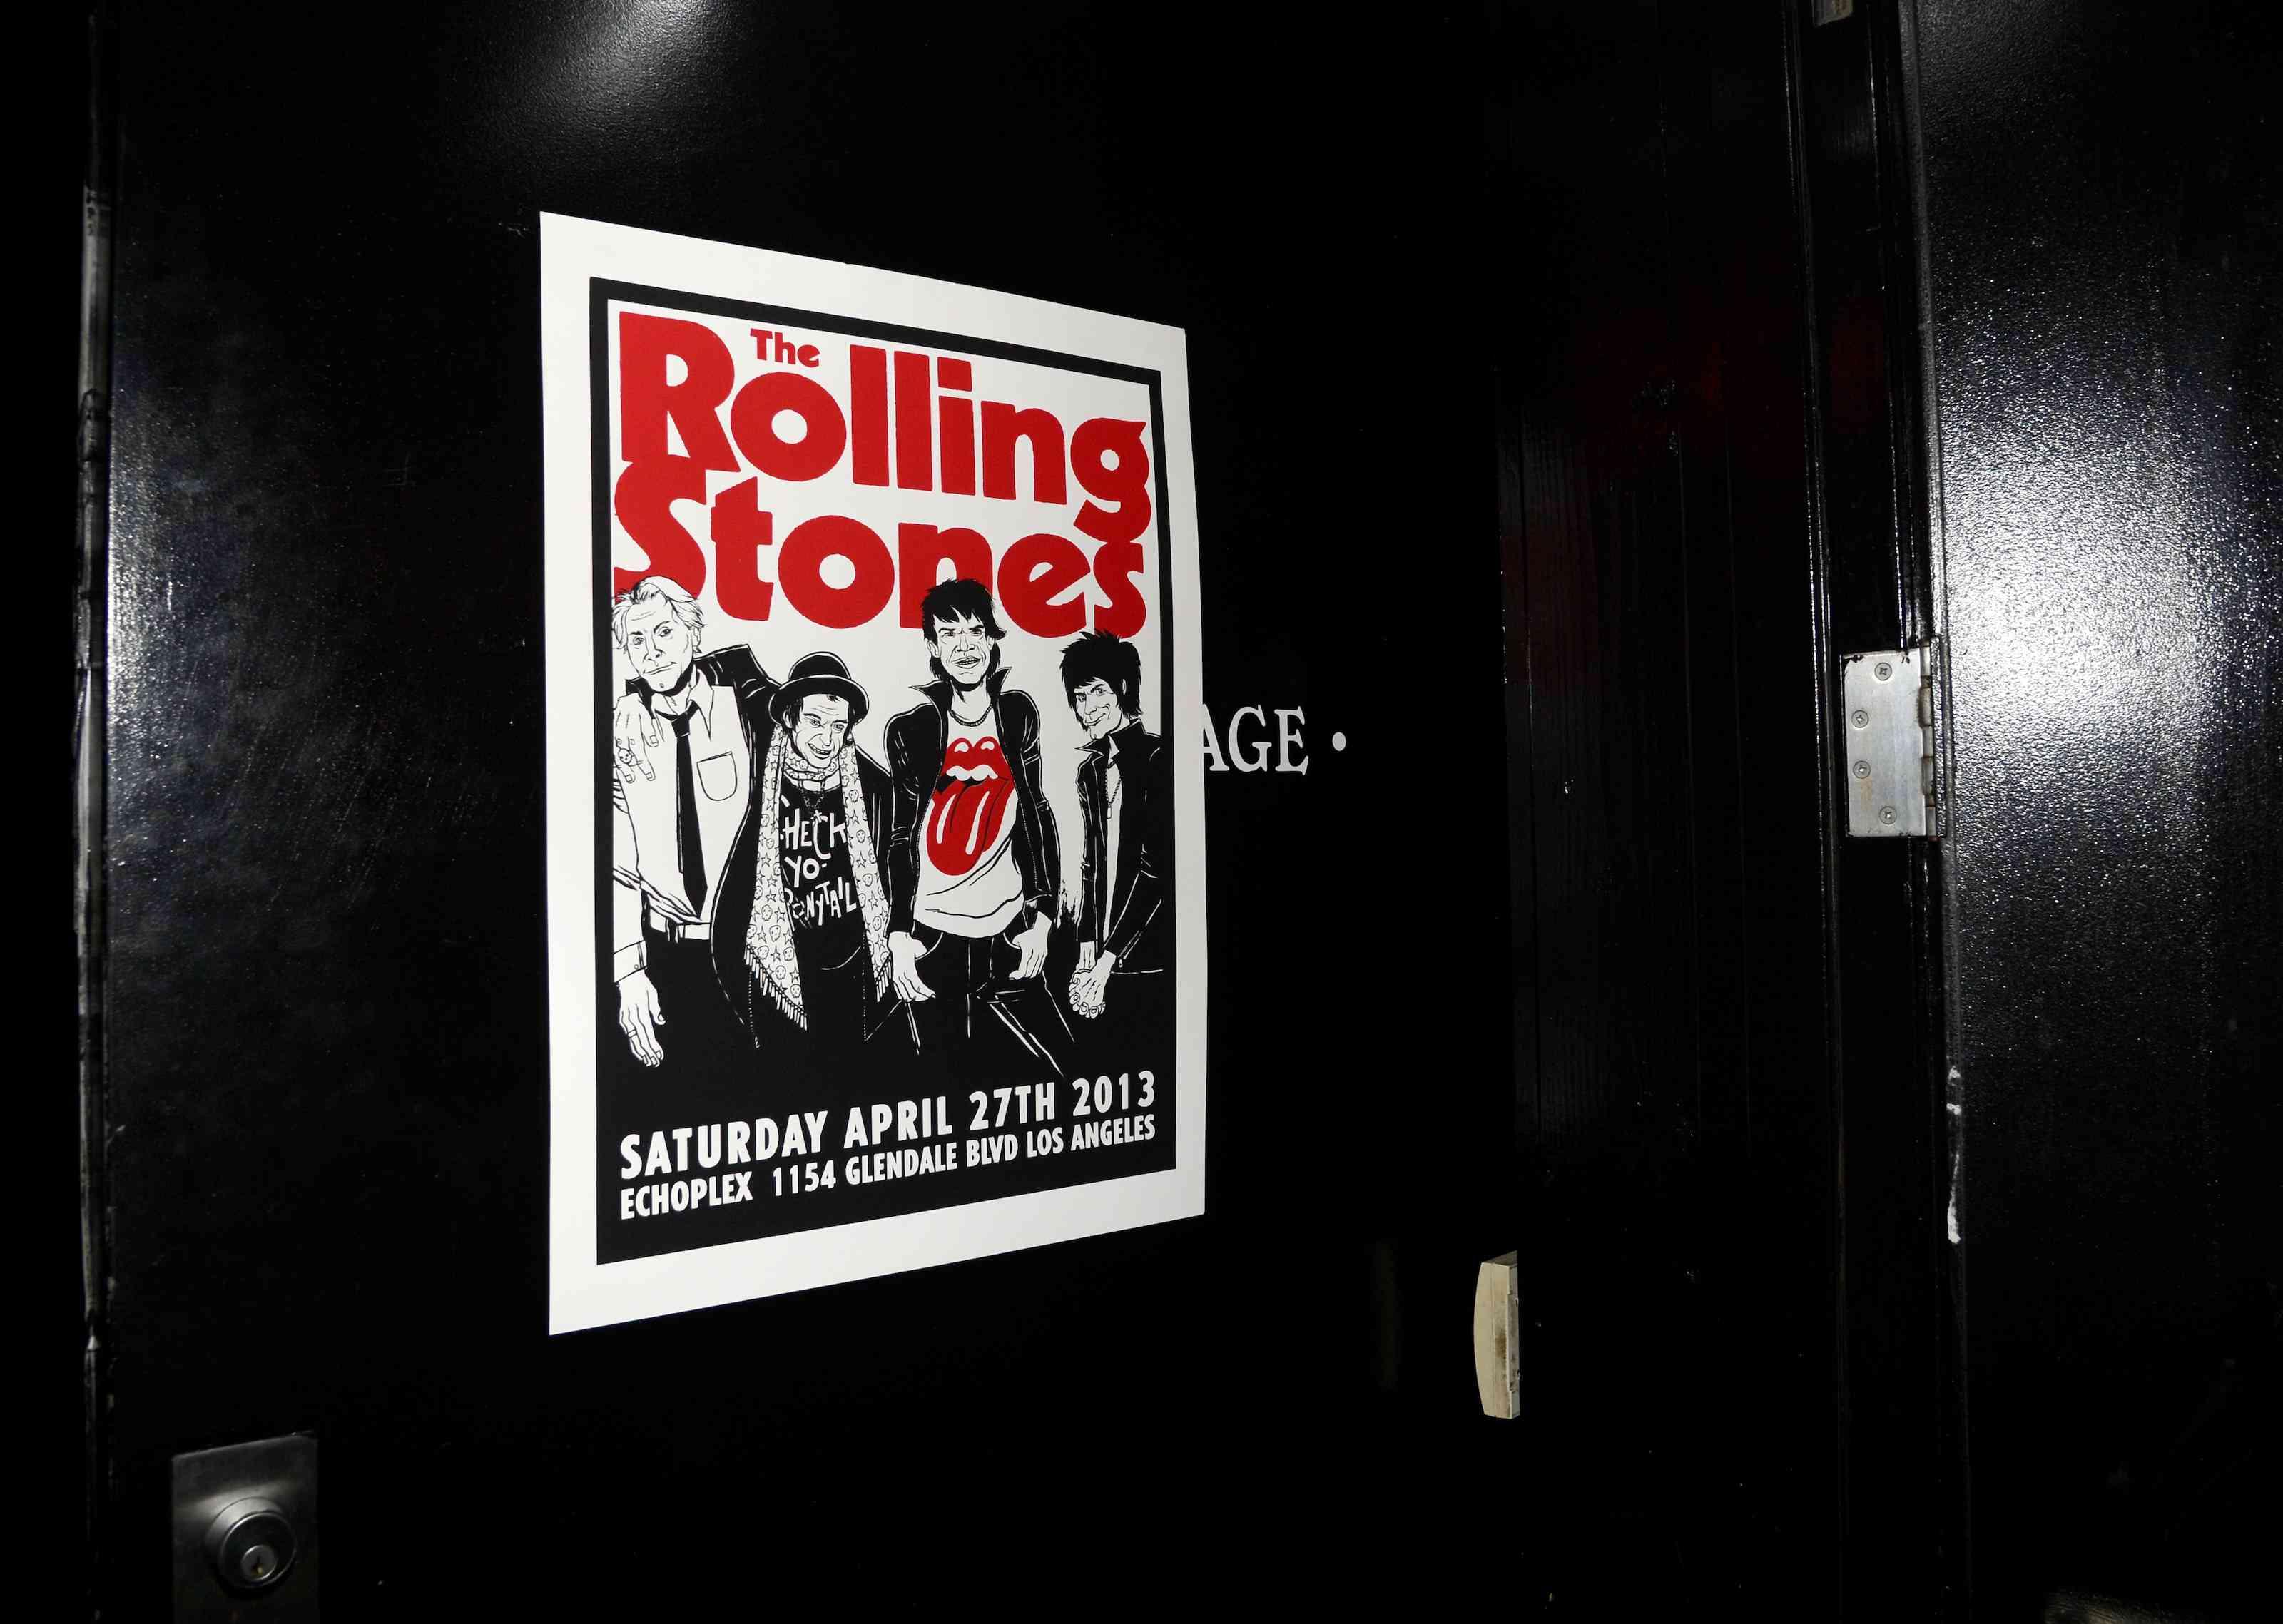 Secret Rolling Stones show at Echoplex